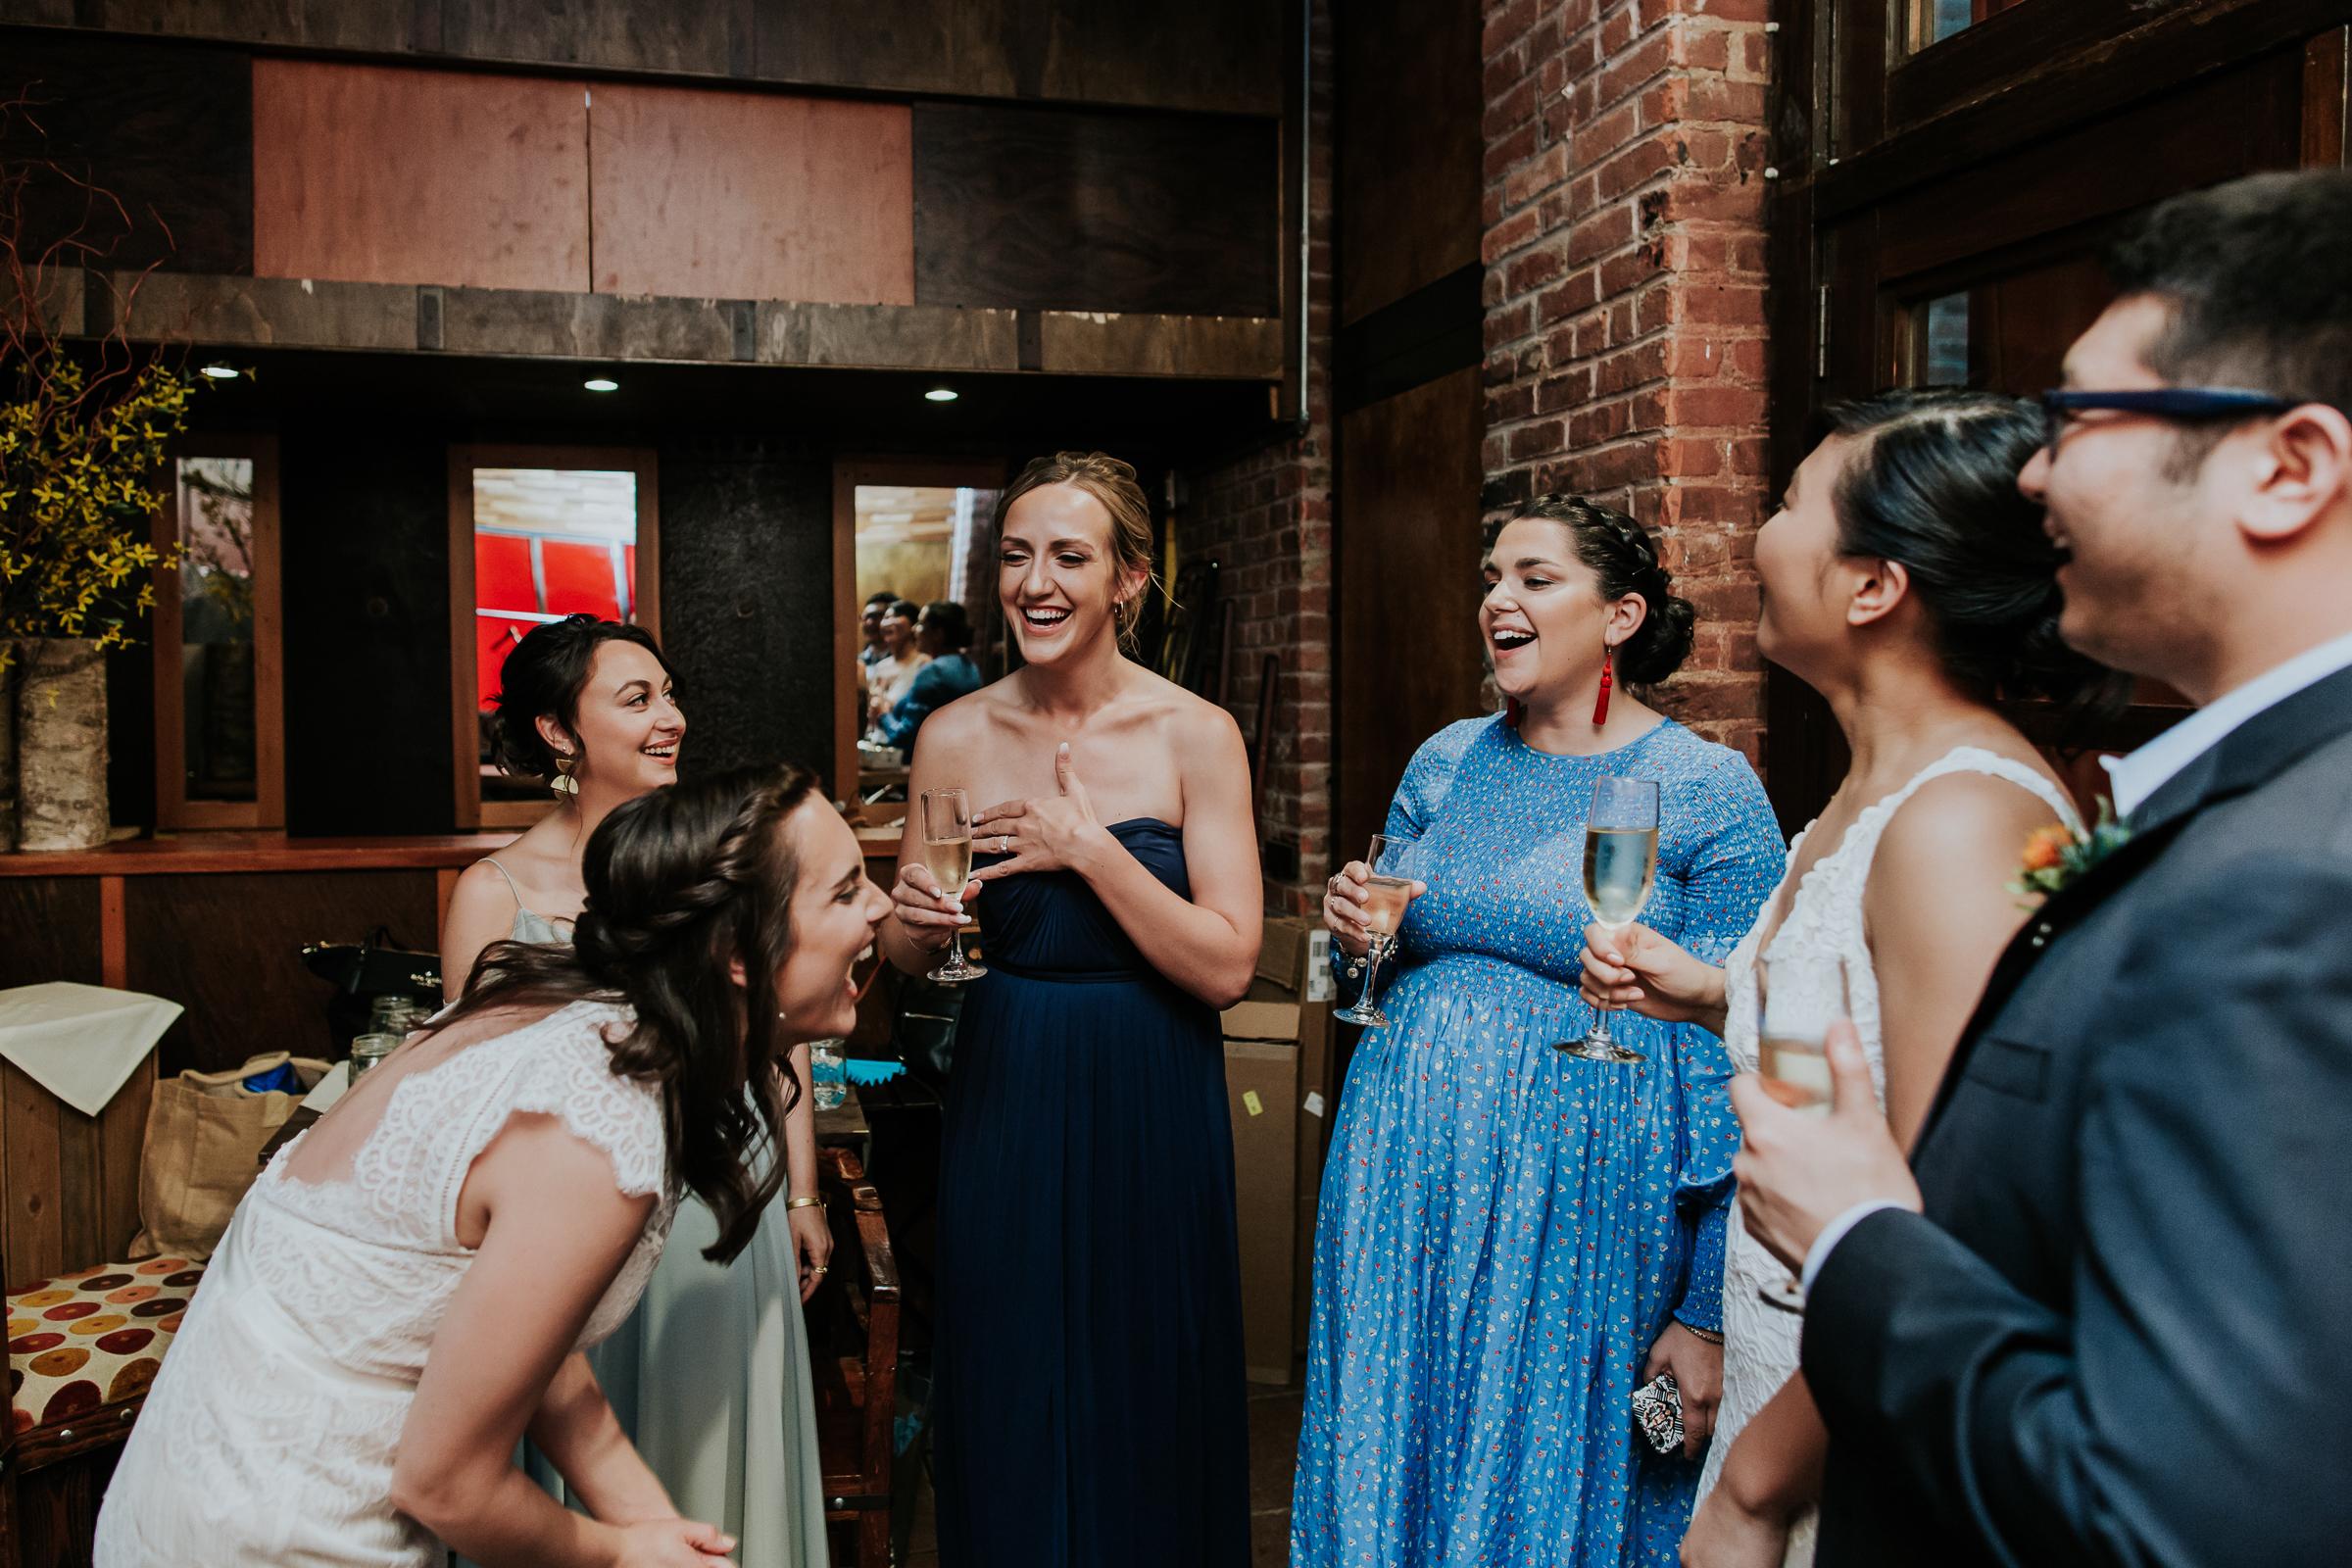 My-Moon-Brooklyn-LGBT-Gay-Documentary-Wedding-Photographer-80.jpg